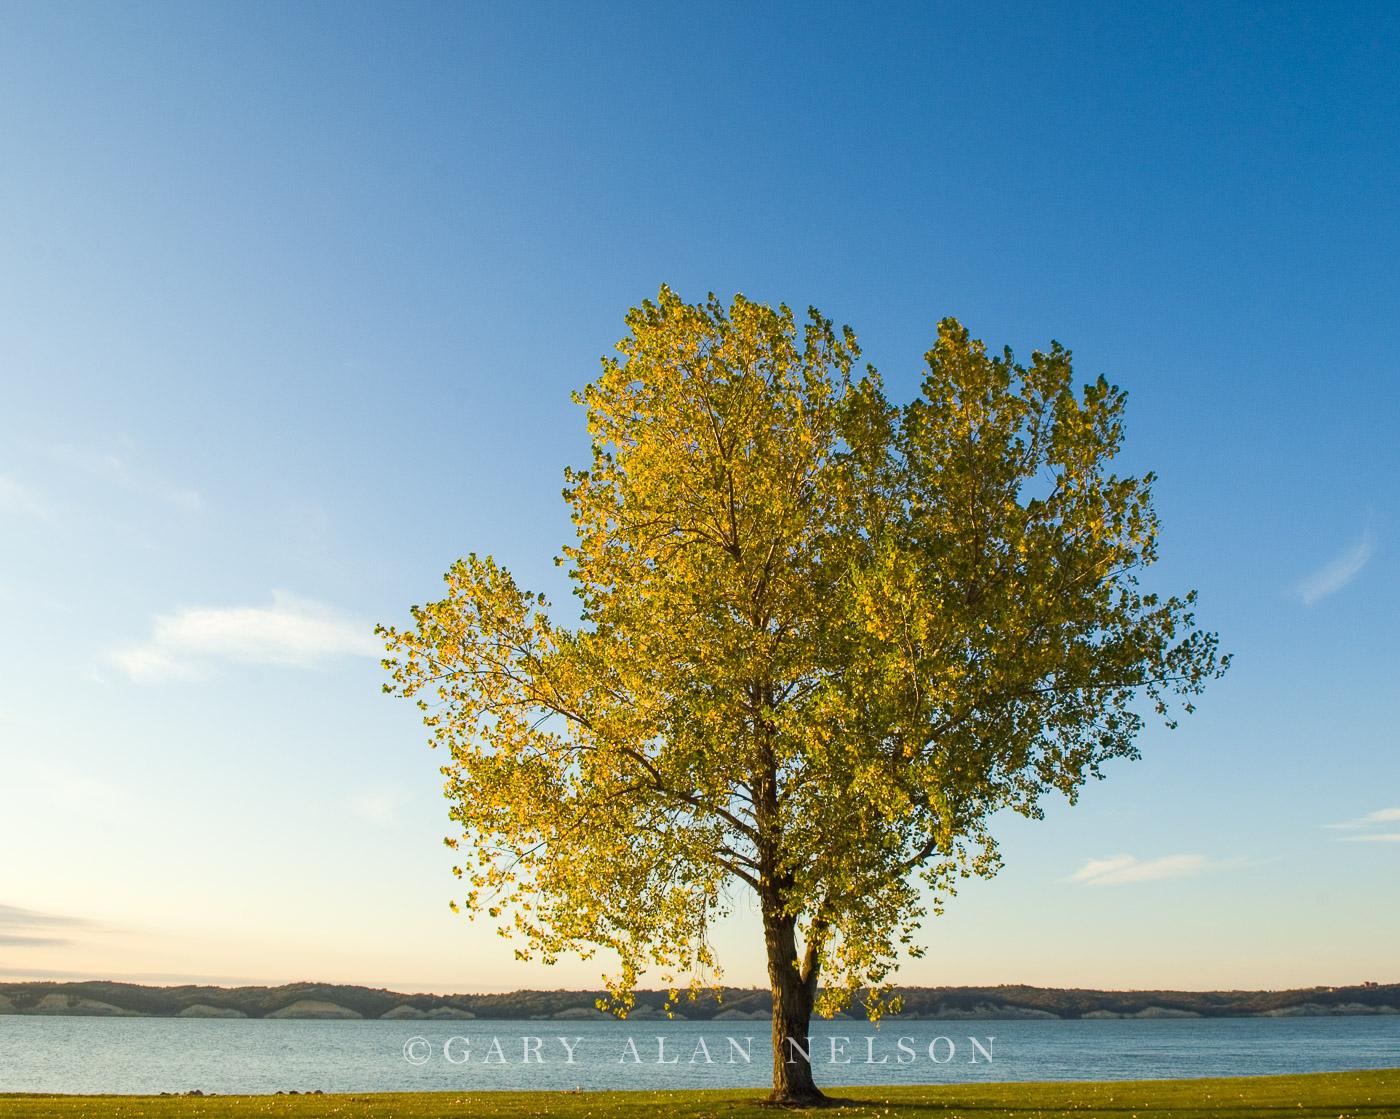 Missouri river, national recreation area, tree, lake, photo